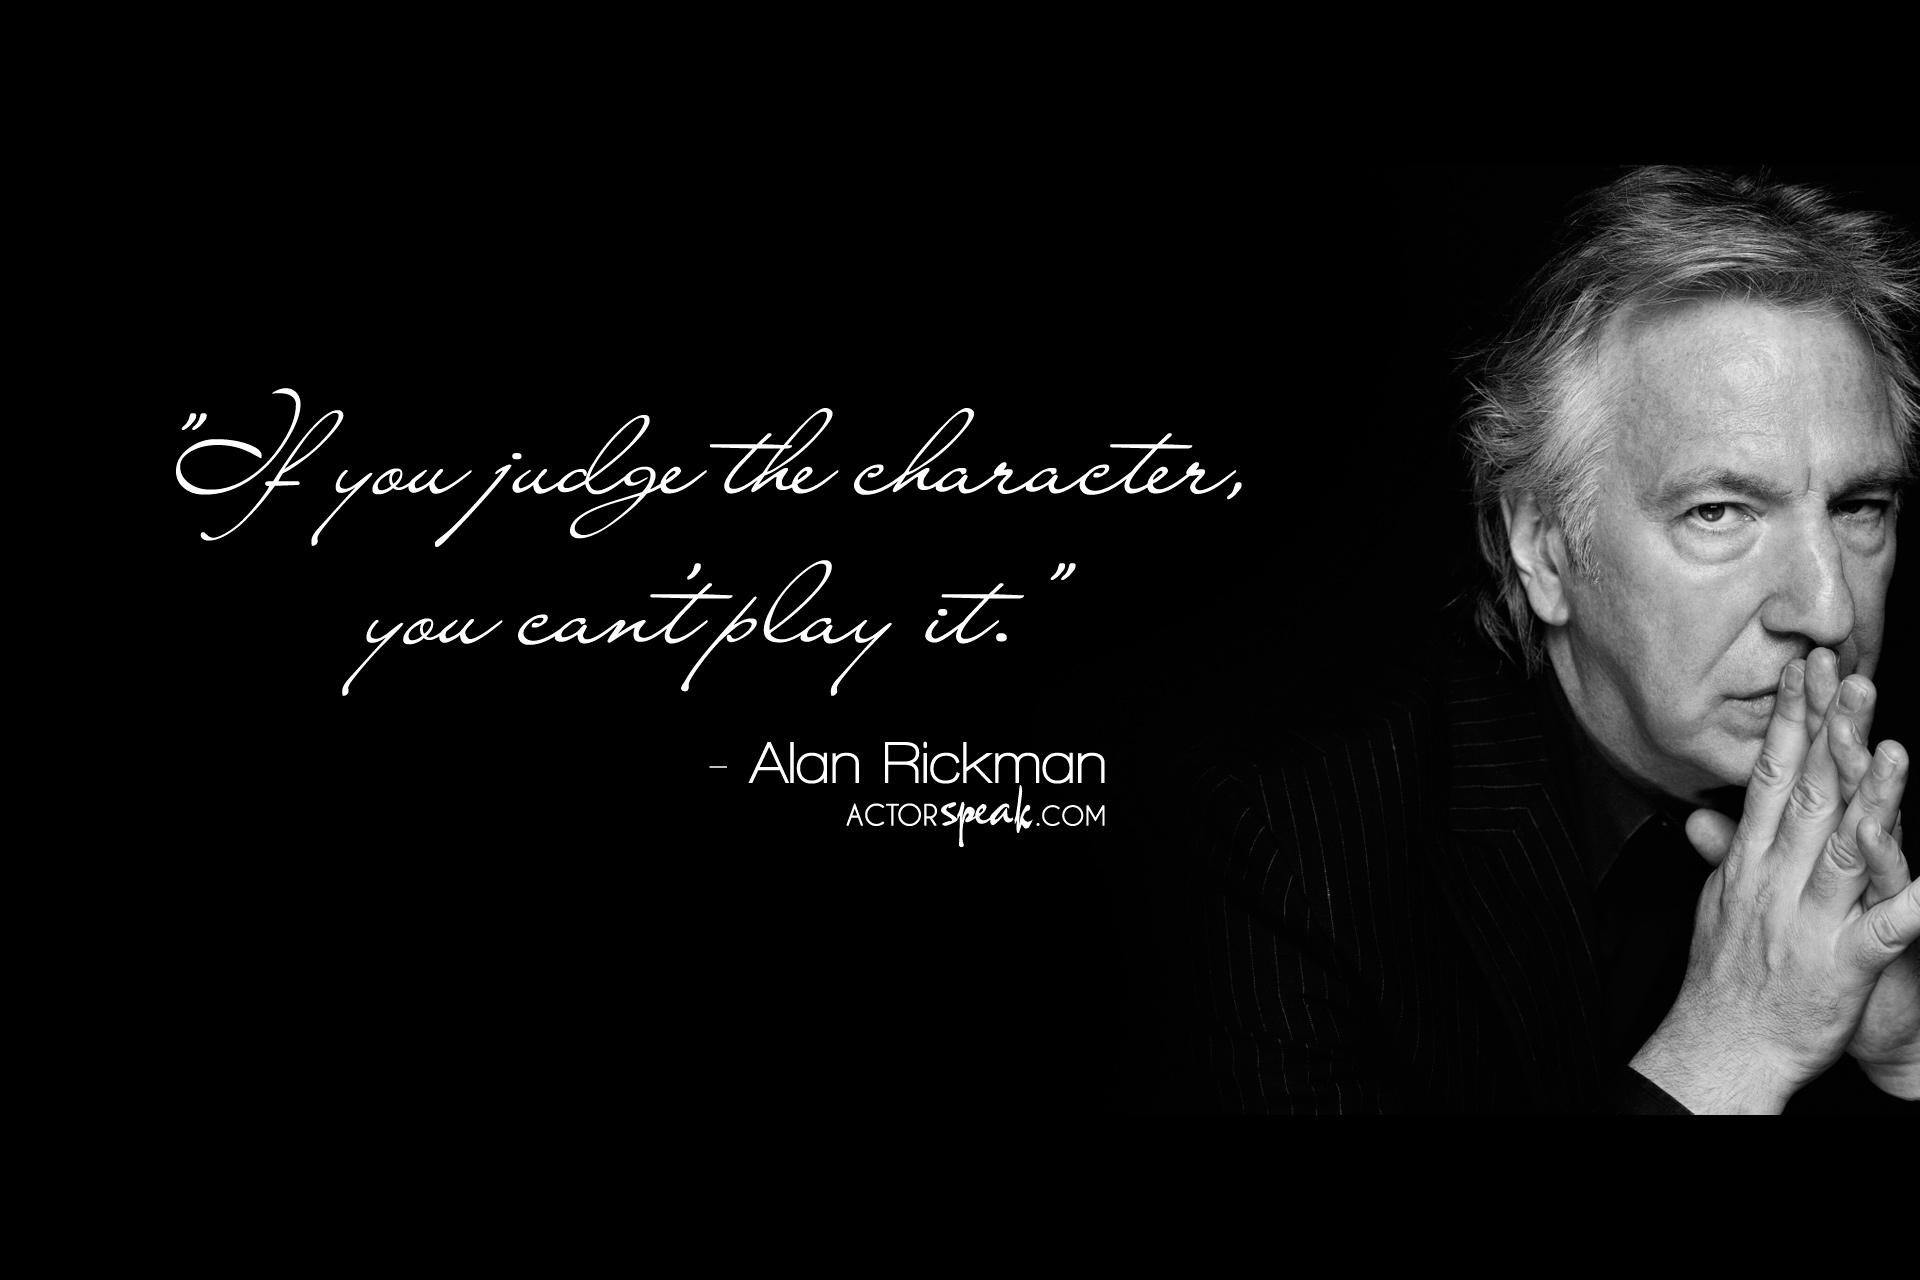 Alan Rickman's quote #1